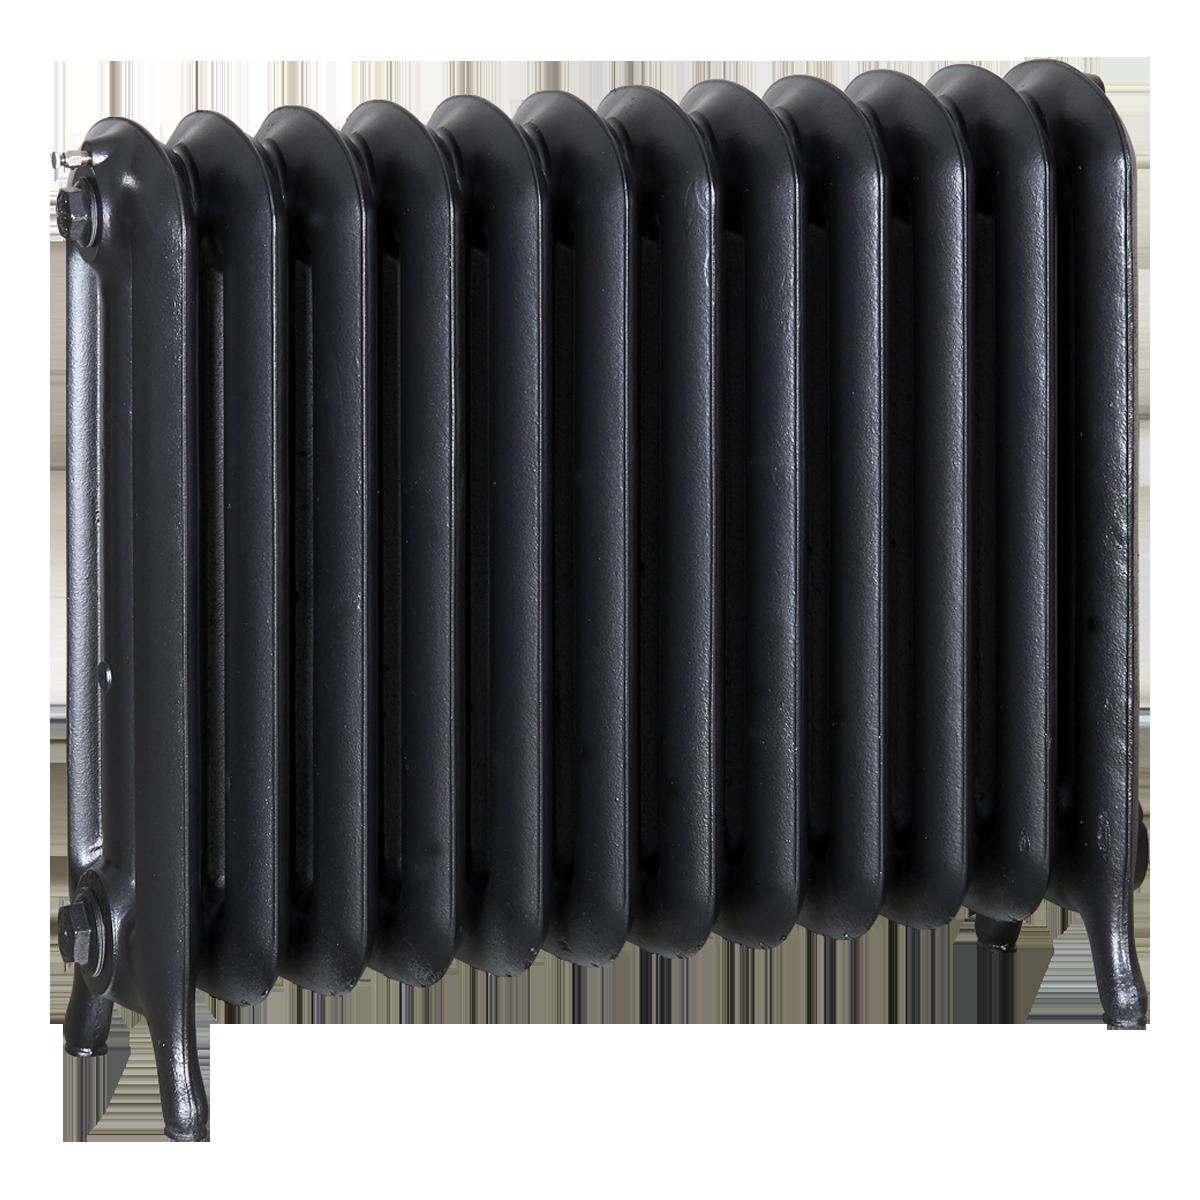 Ironworks Radiators Inc. refurbished cast iron radiator Milton in Black Pearl metallic